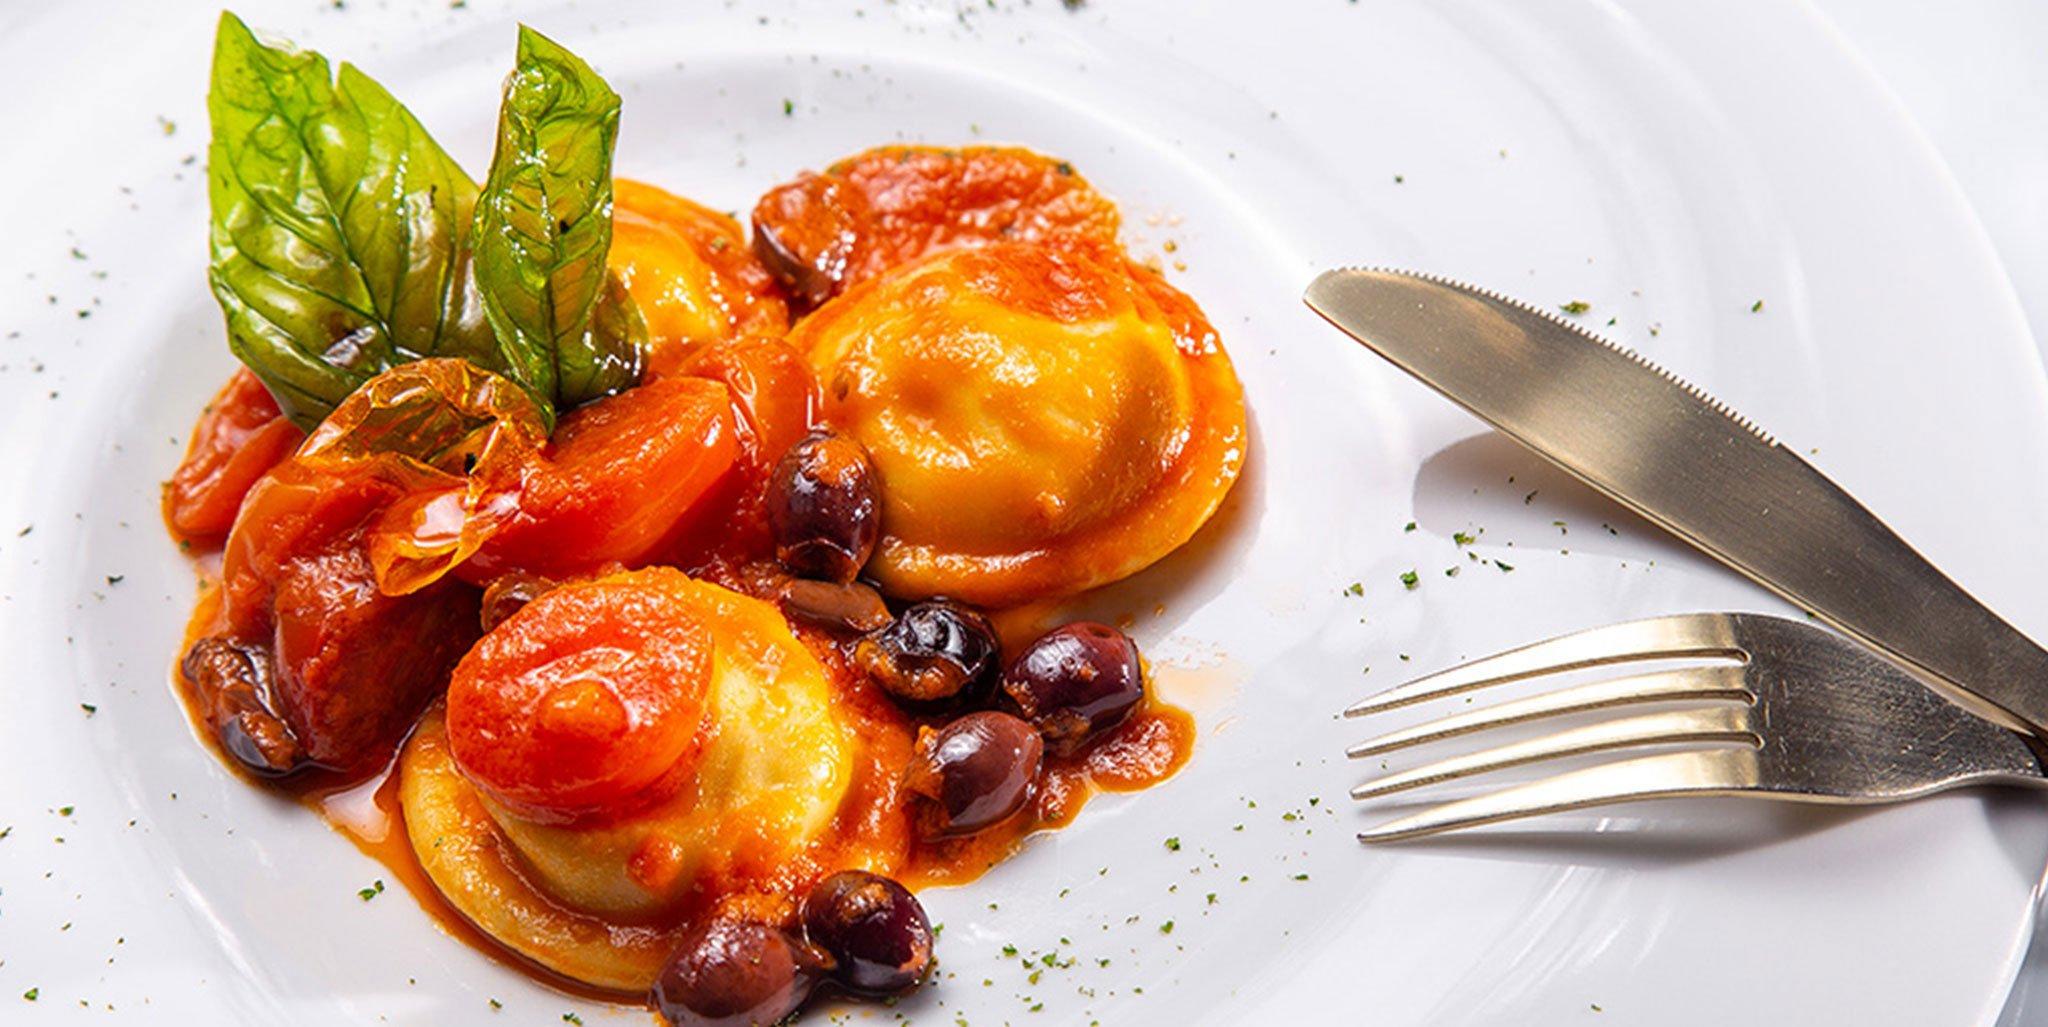 Pasta fresca para llevar en Jávea – Restaurante Da Giulia